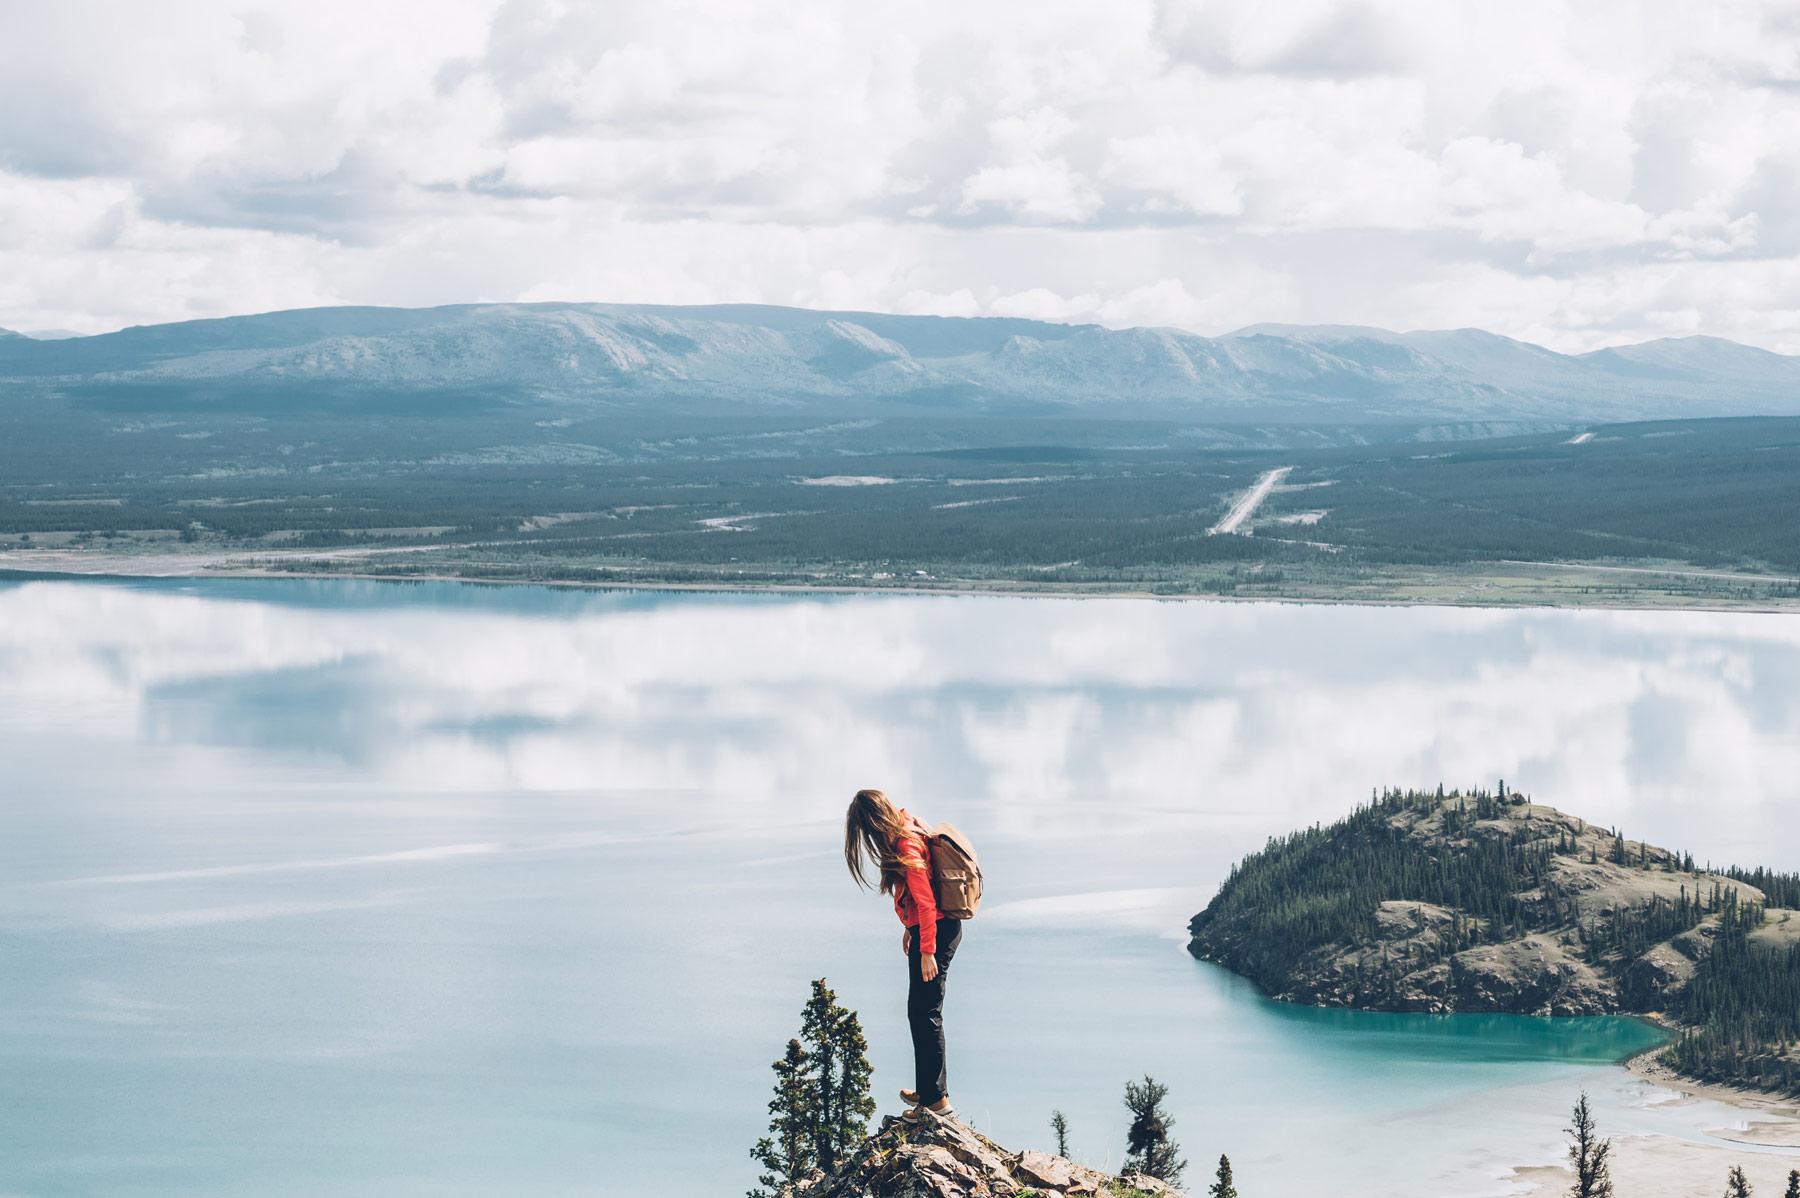 Rando Yukon, Canada